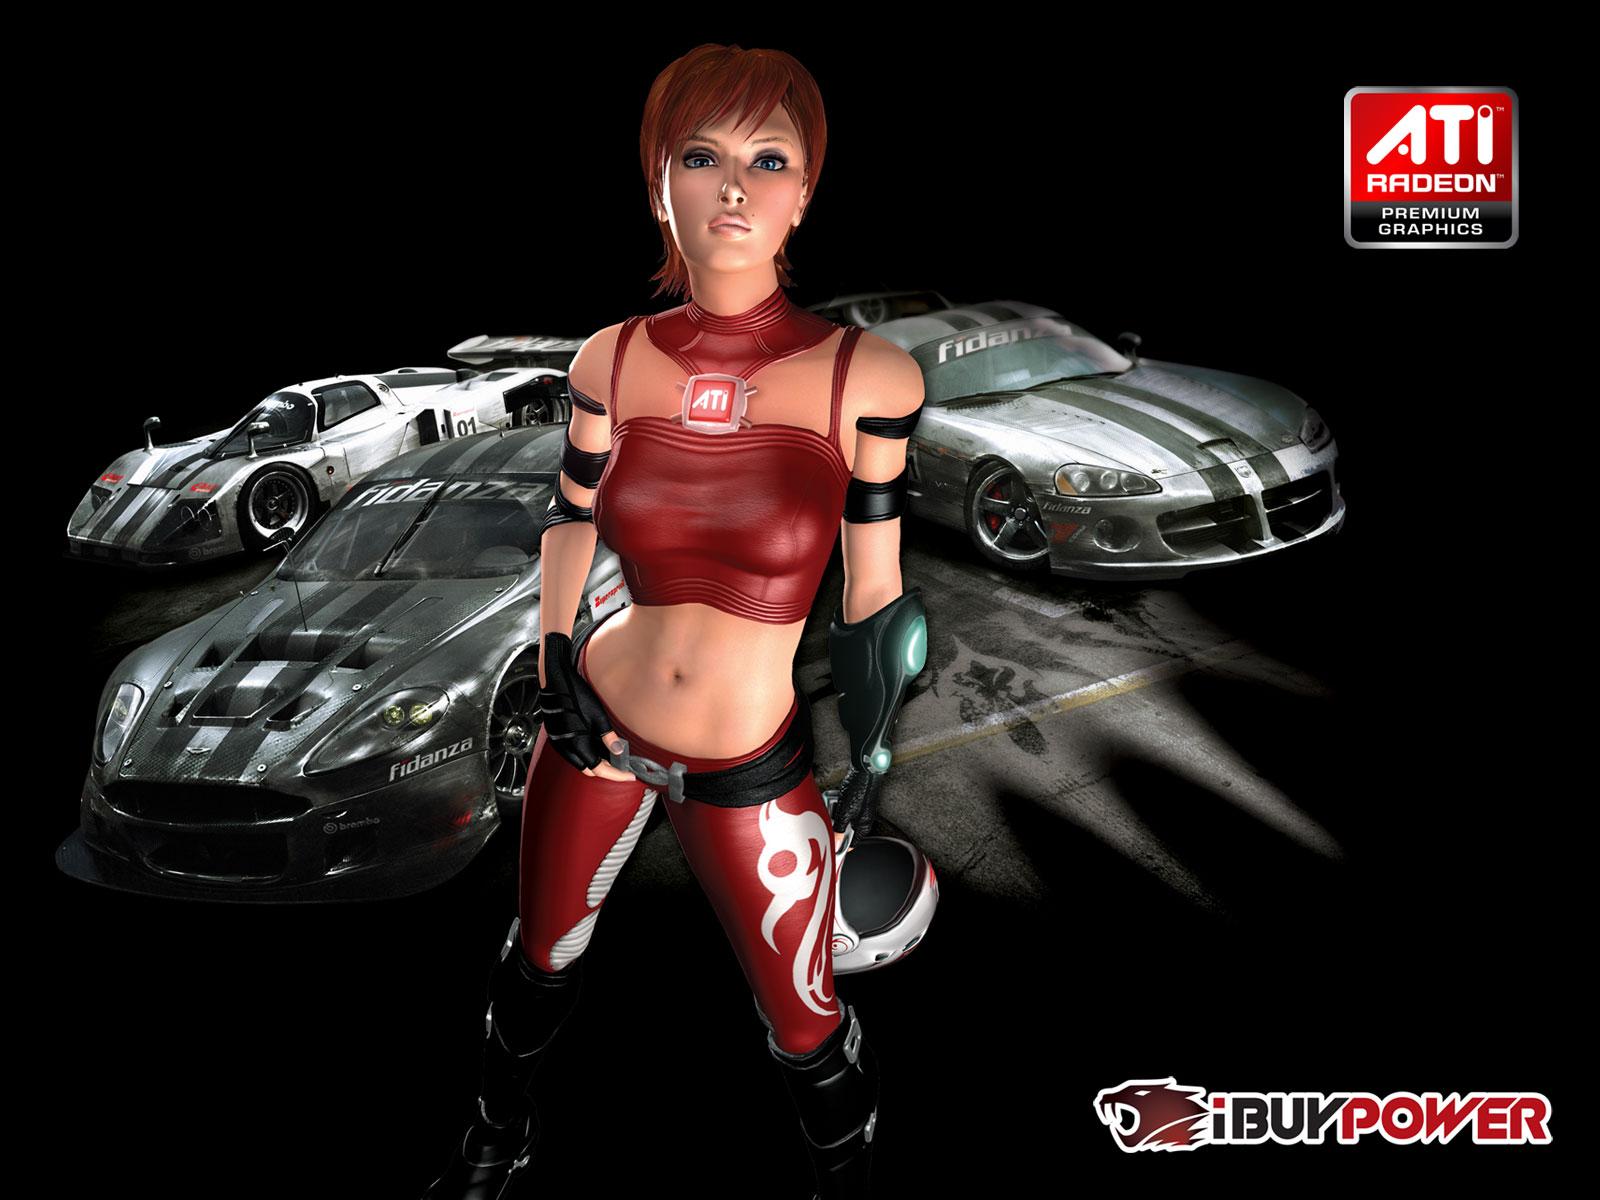 http://3.bp.blogspot.com/_3_wwcvitlLc/SwO_pUvMyVI/AAAAAAAABrE/DtMxzPsCc74/s1600/ati-ruby-racing-wallpaper-1600x1200.jpg